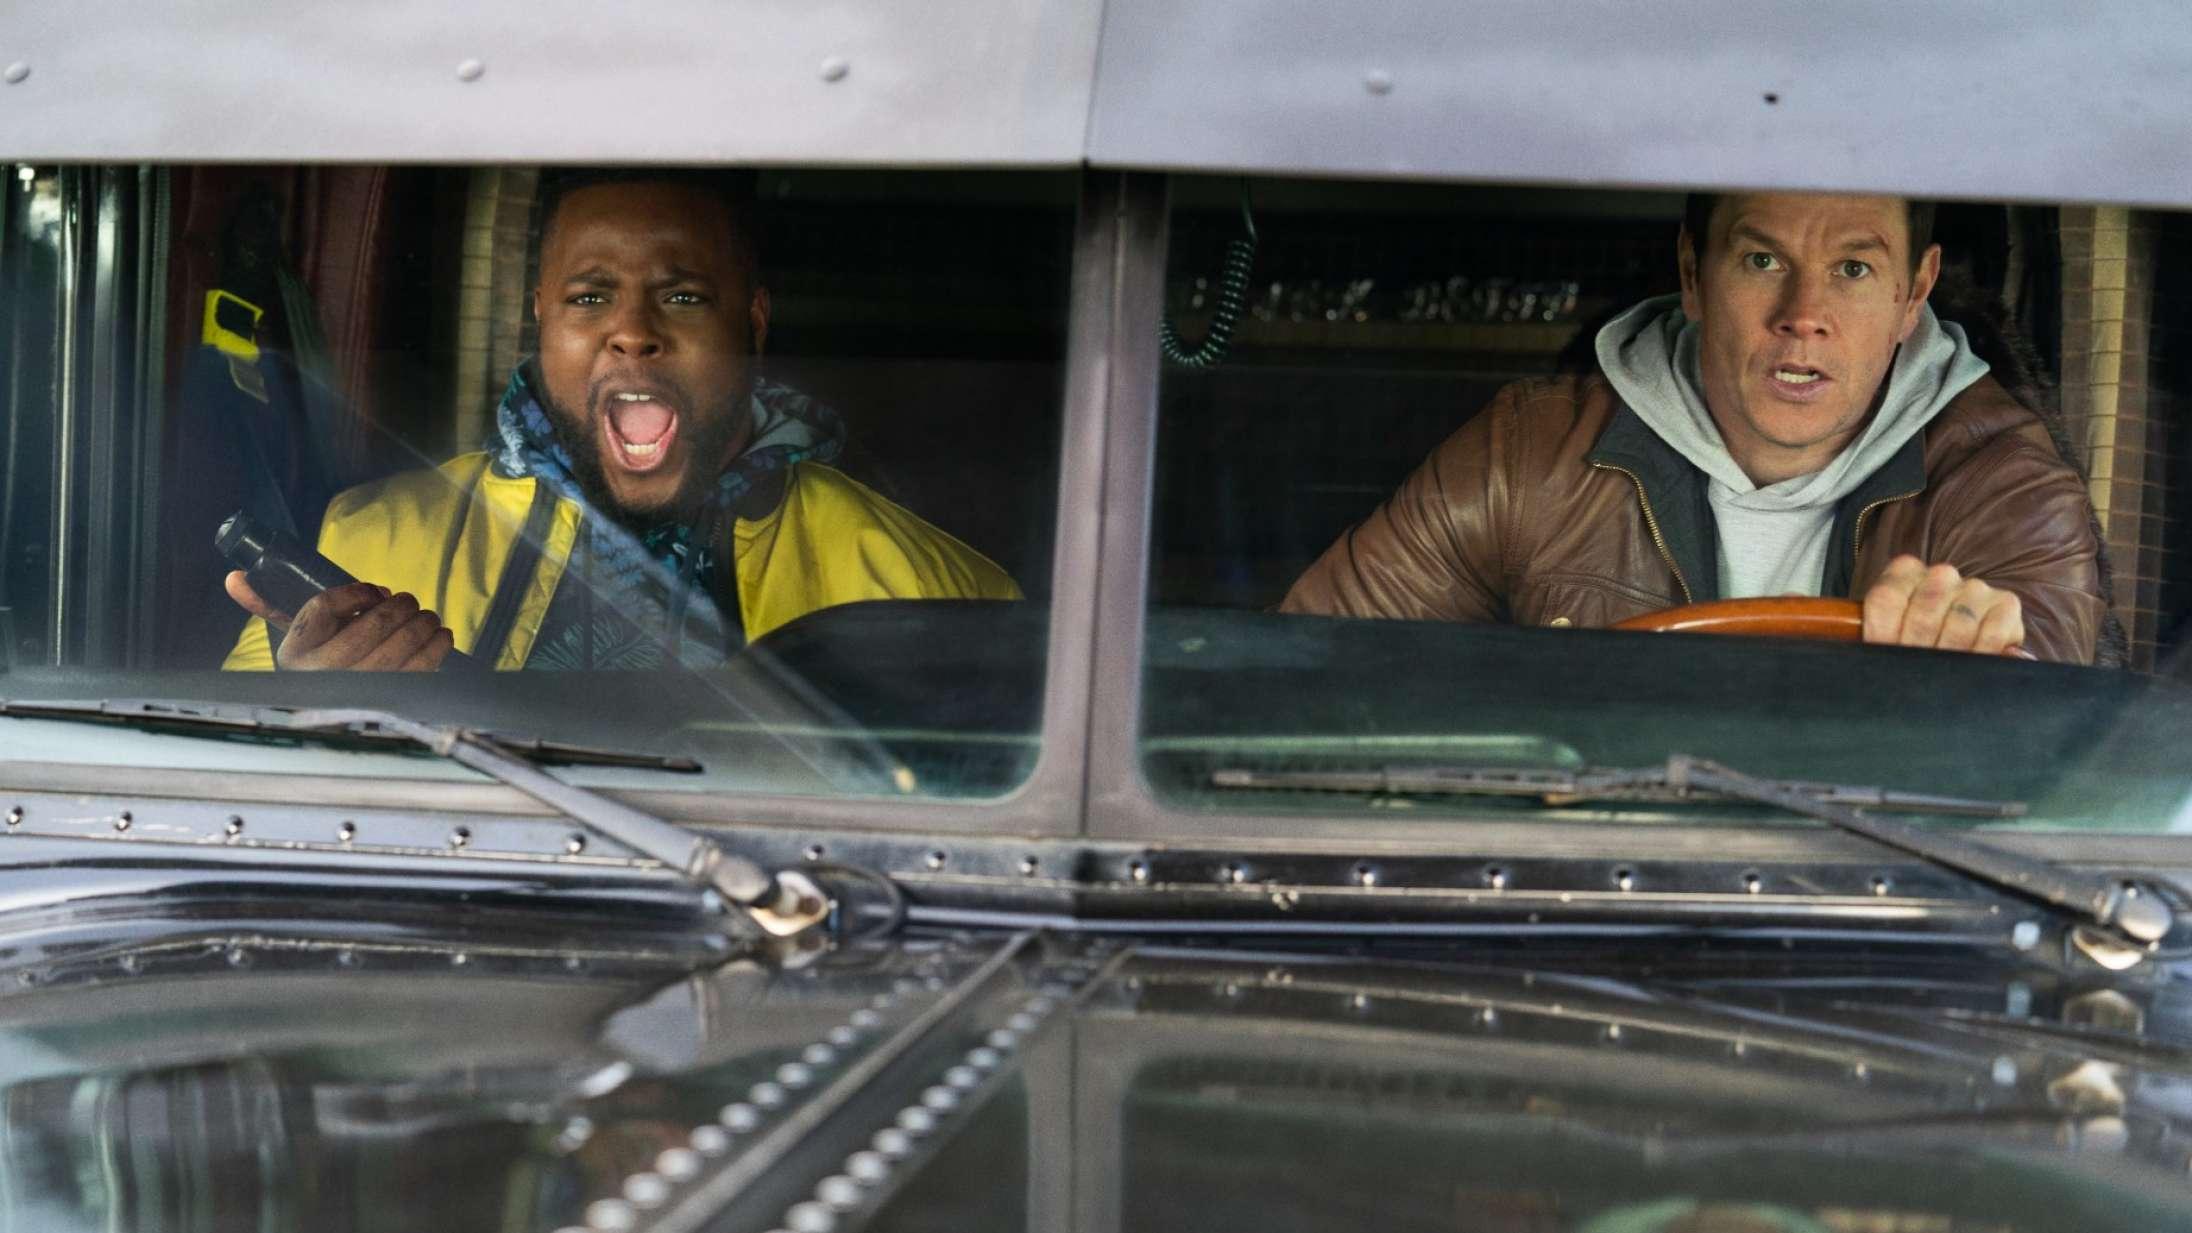 'Spenser Confidential': Mark Wahlberg leverer bankekød til slemme drenge i blodfattig Netflix-film